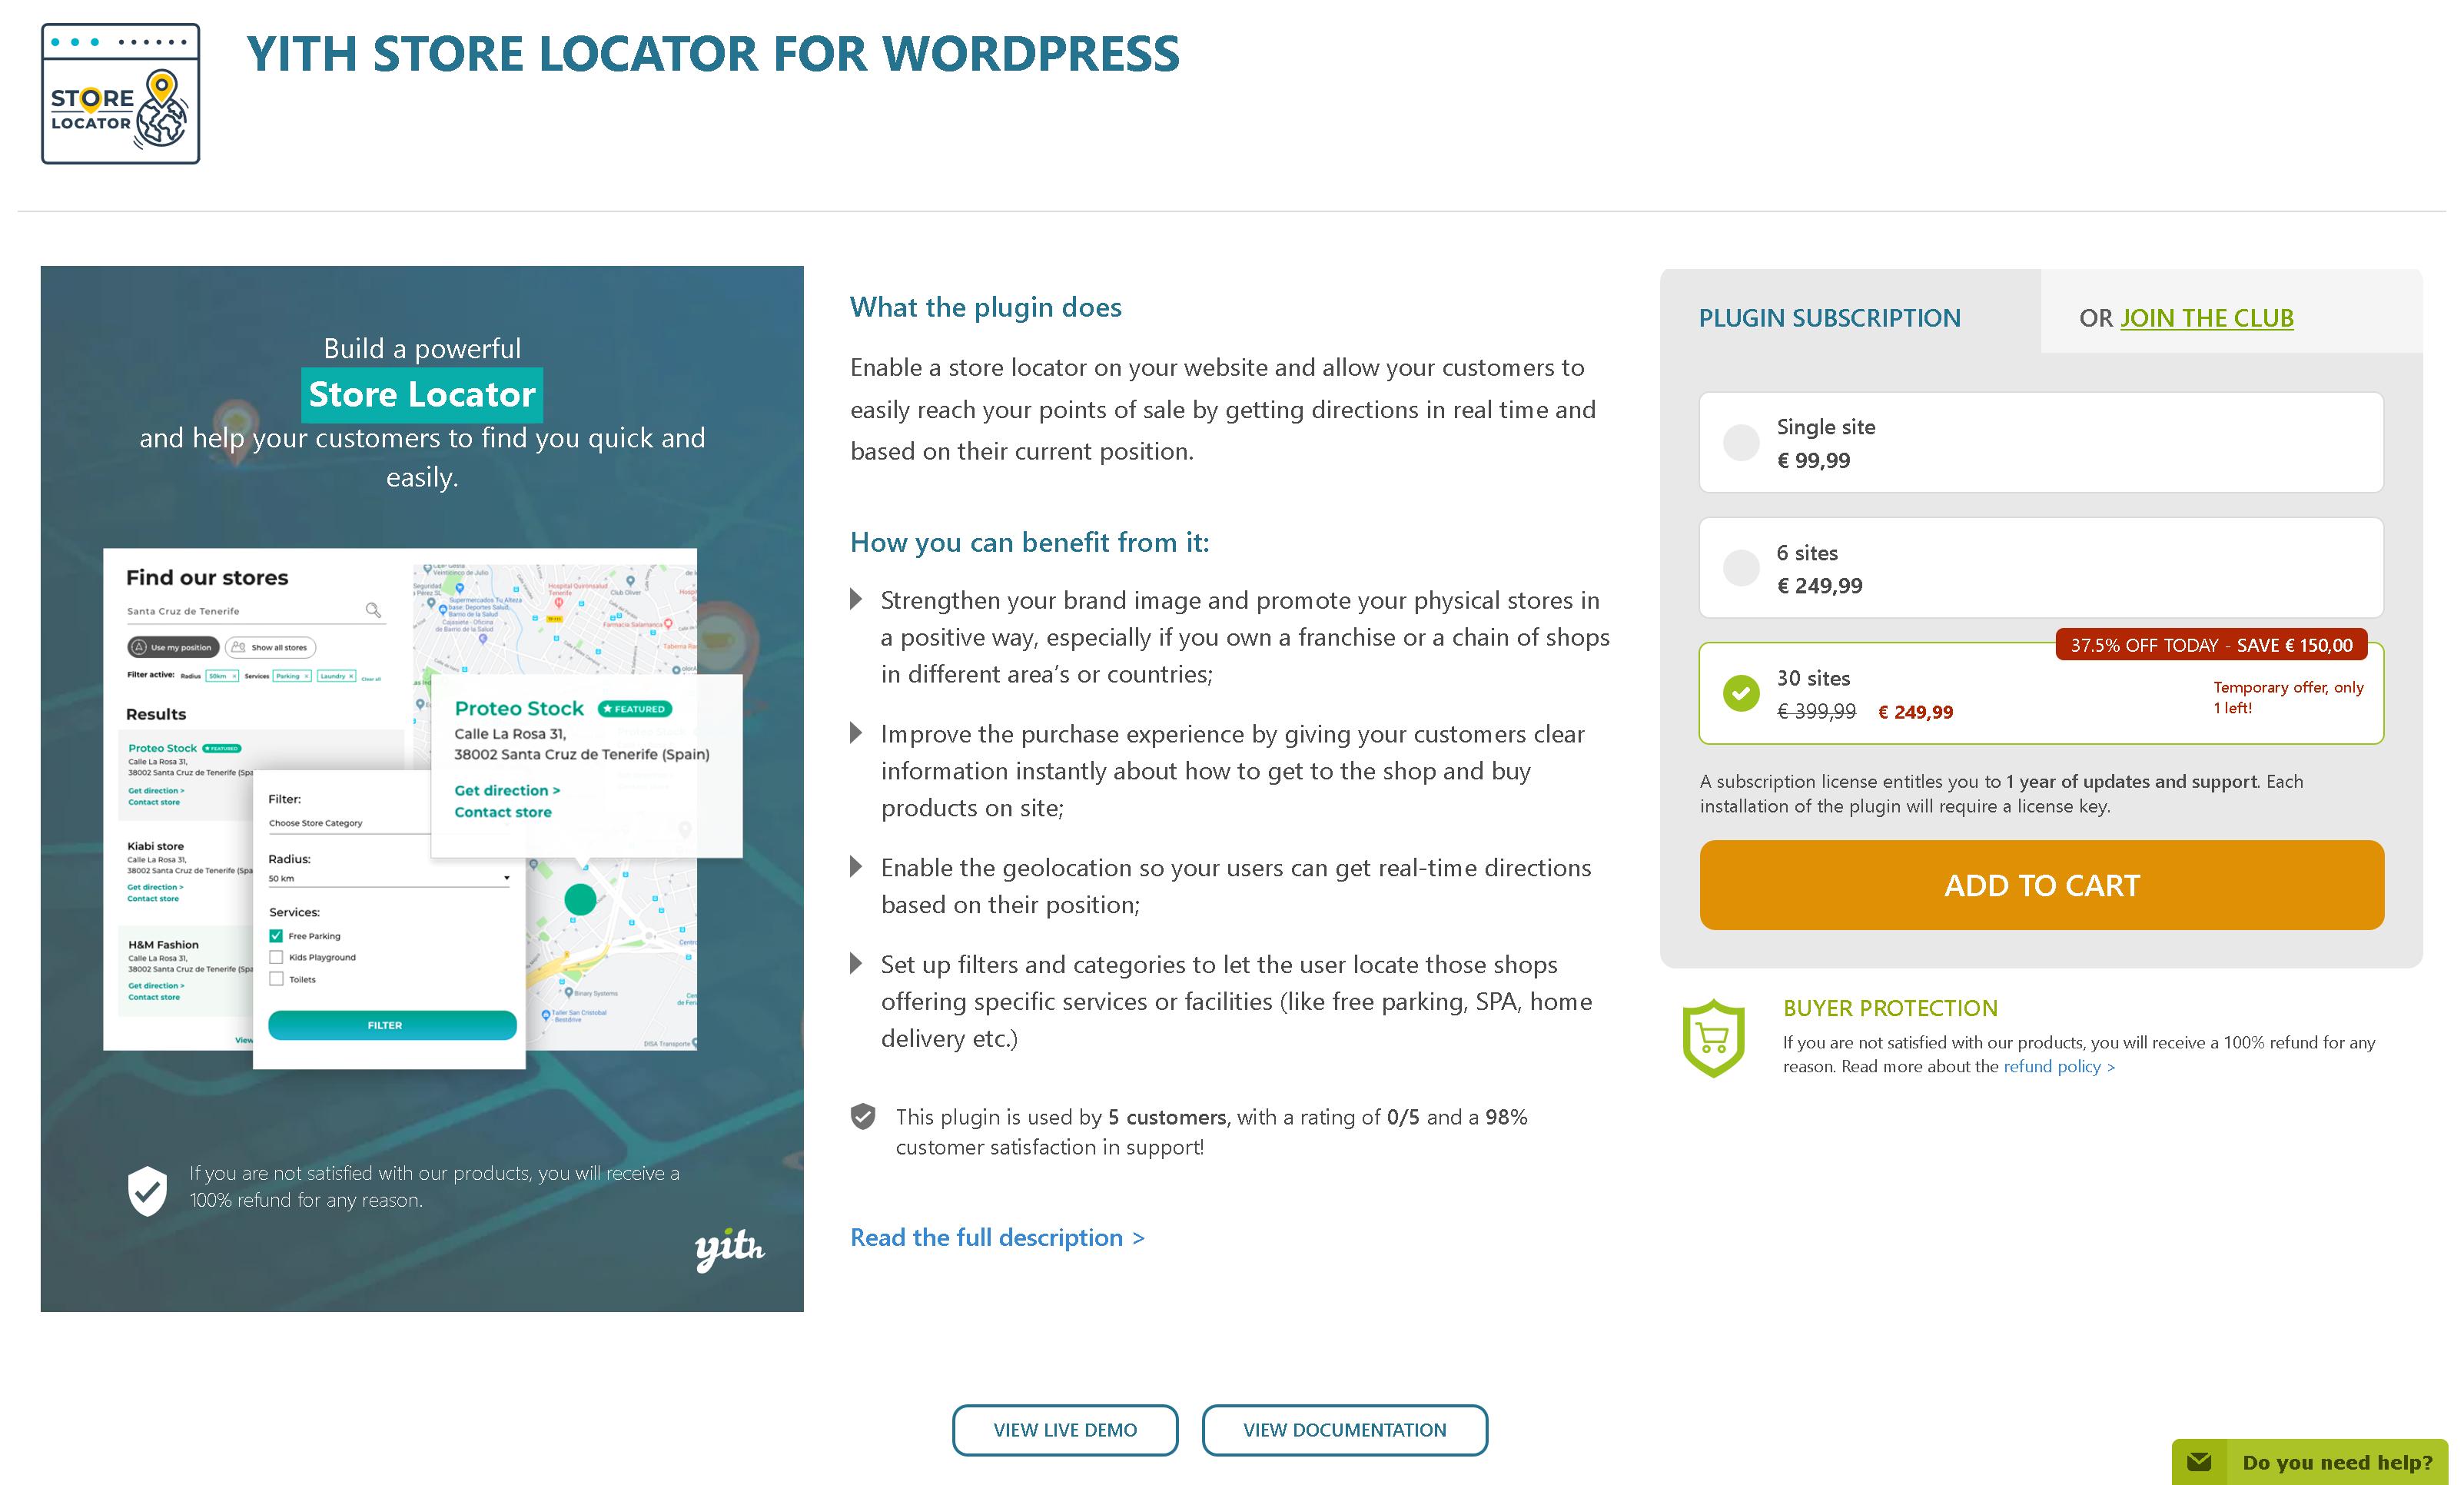 YITH Store Locator for WordPress 1.0.2